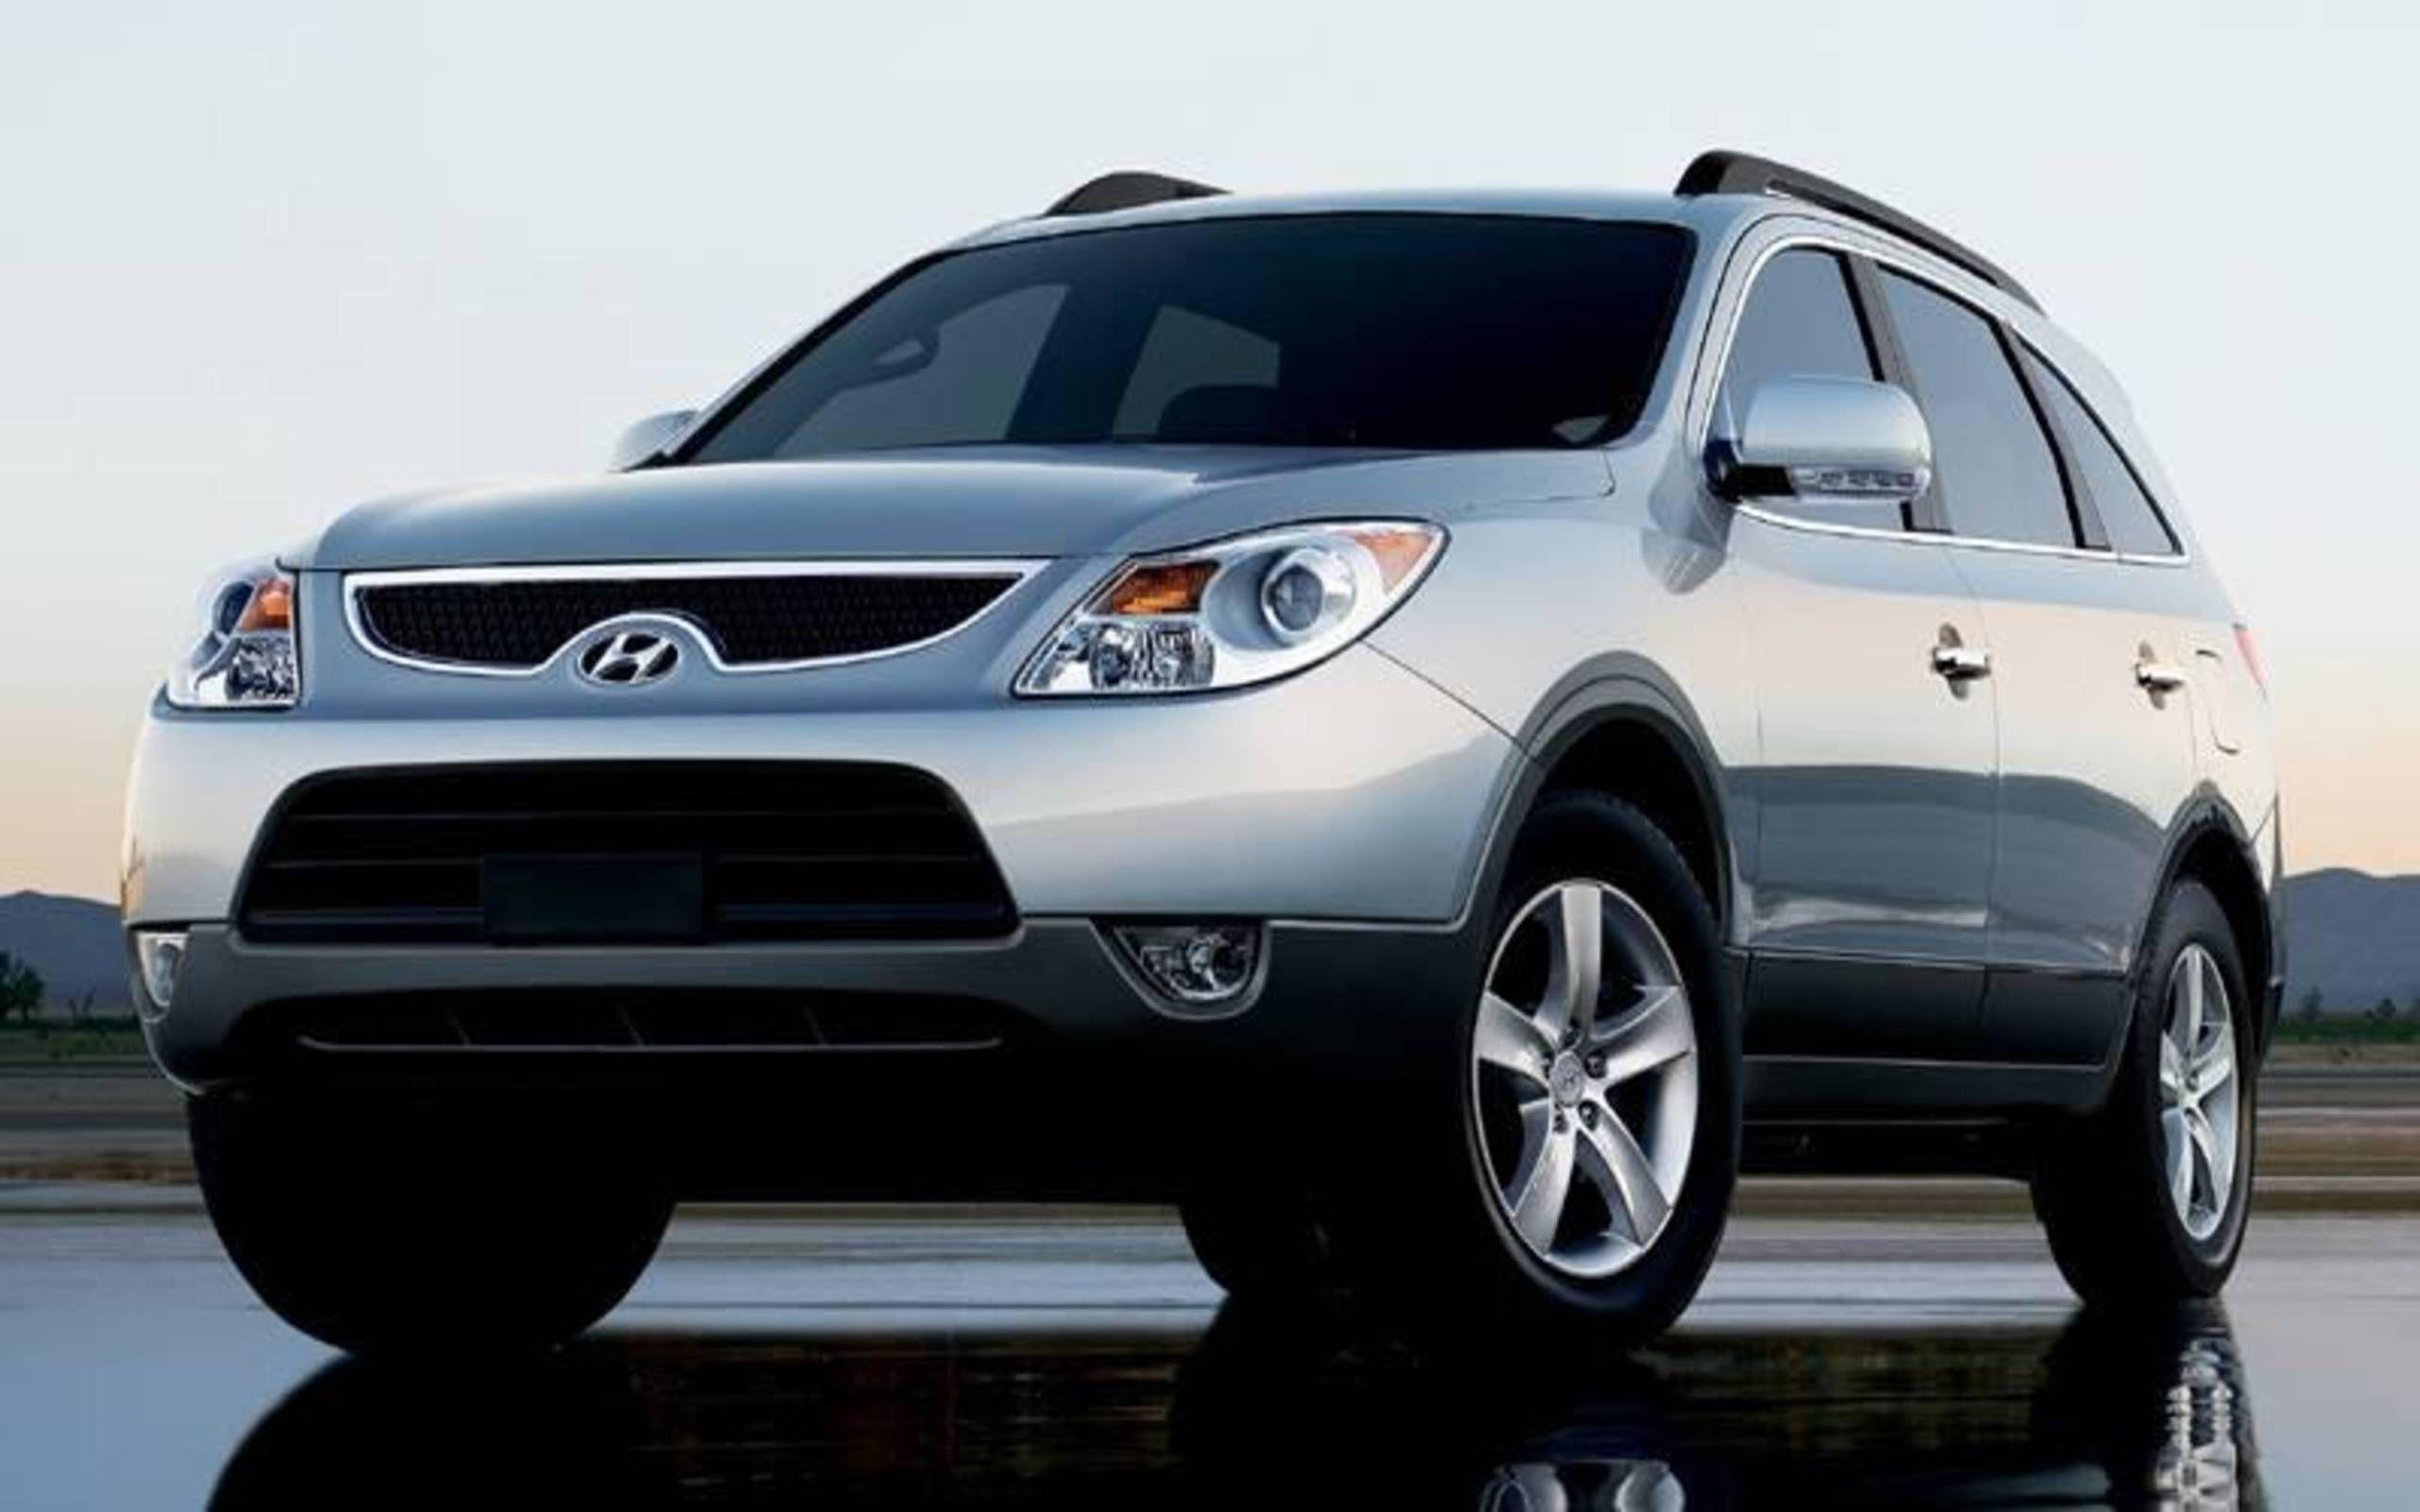 Veracruz Is One Hot Hyundai: Premium crossover has strong launch